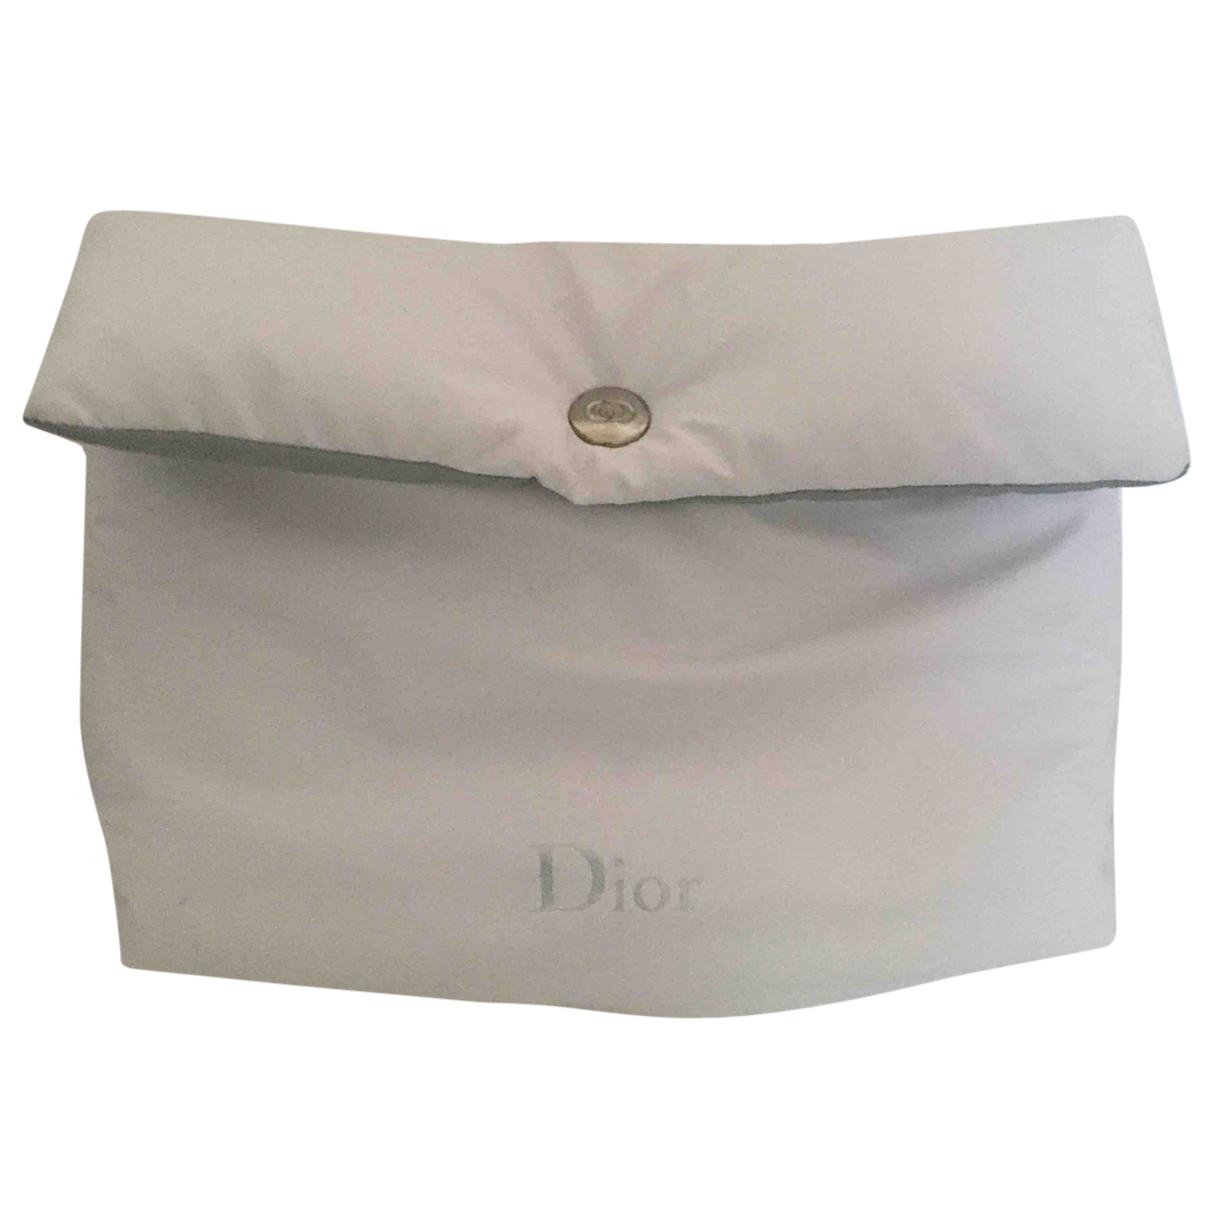 Dior N White Home decor for Life & Living N